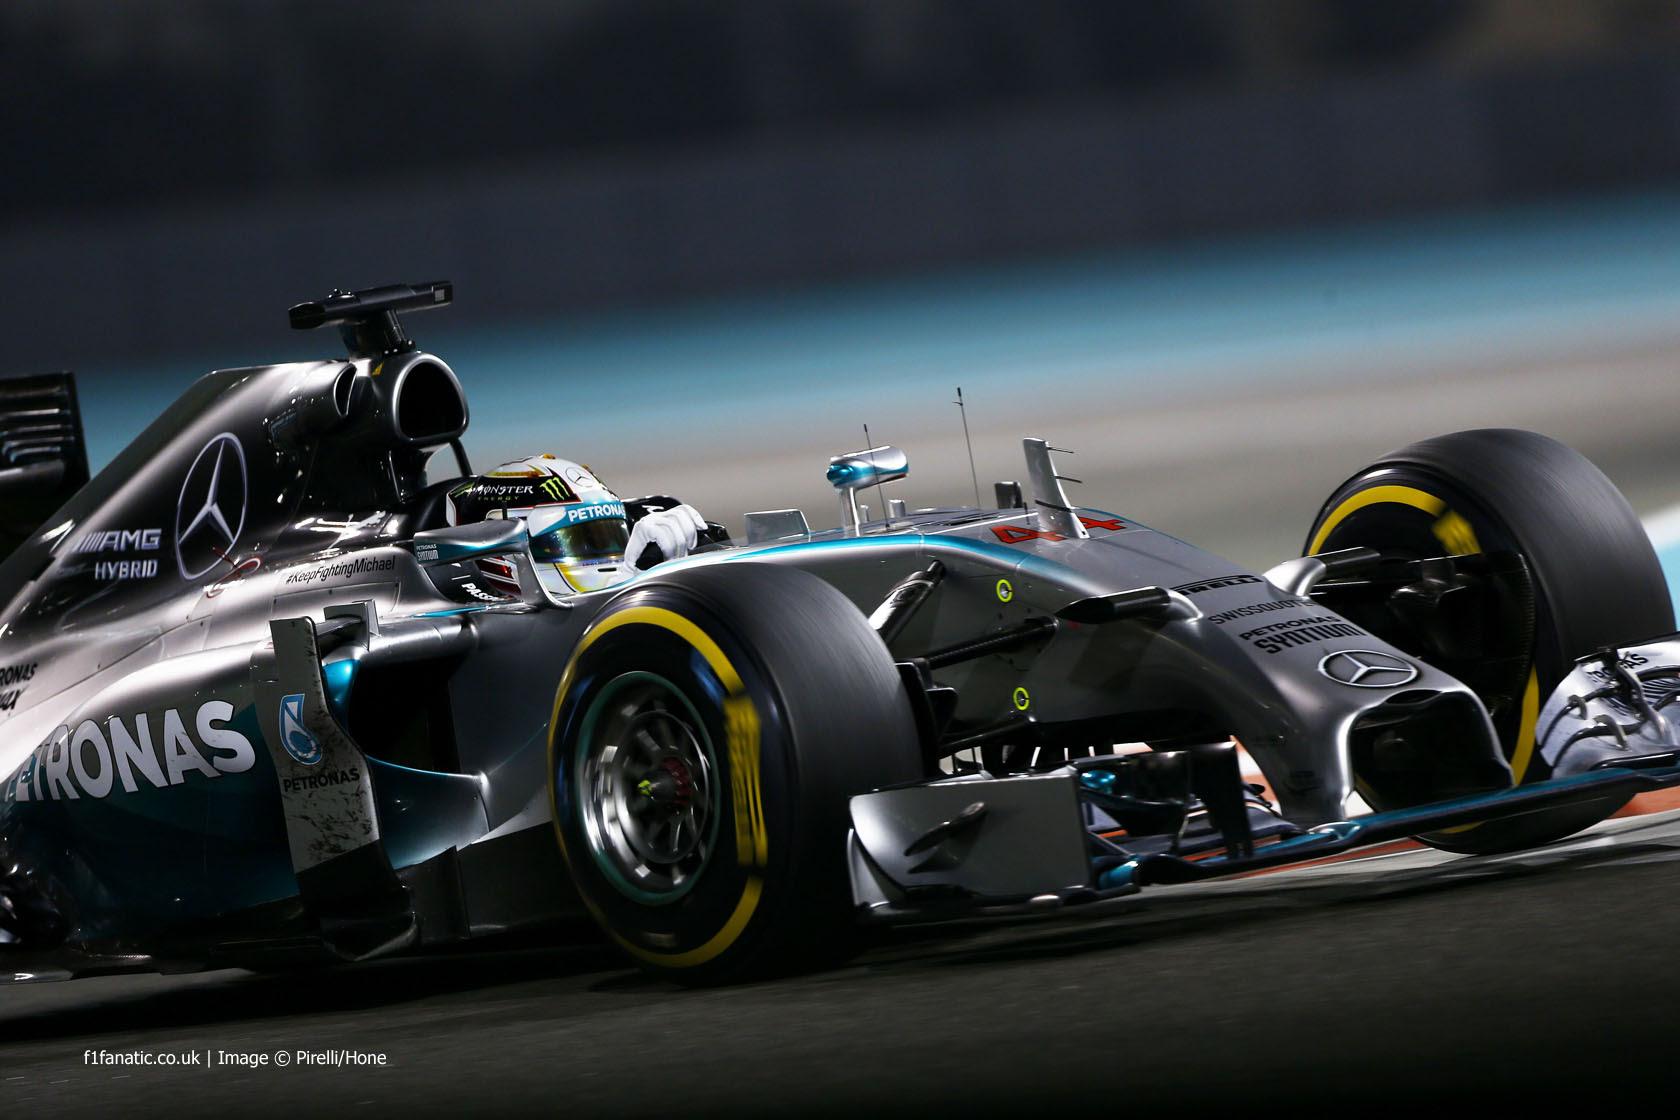 Lewis Hamilton, Mercedes, Yas Marina, 2014 · F1 Fanatic